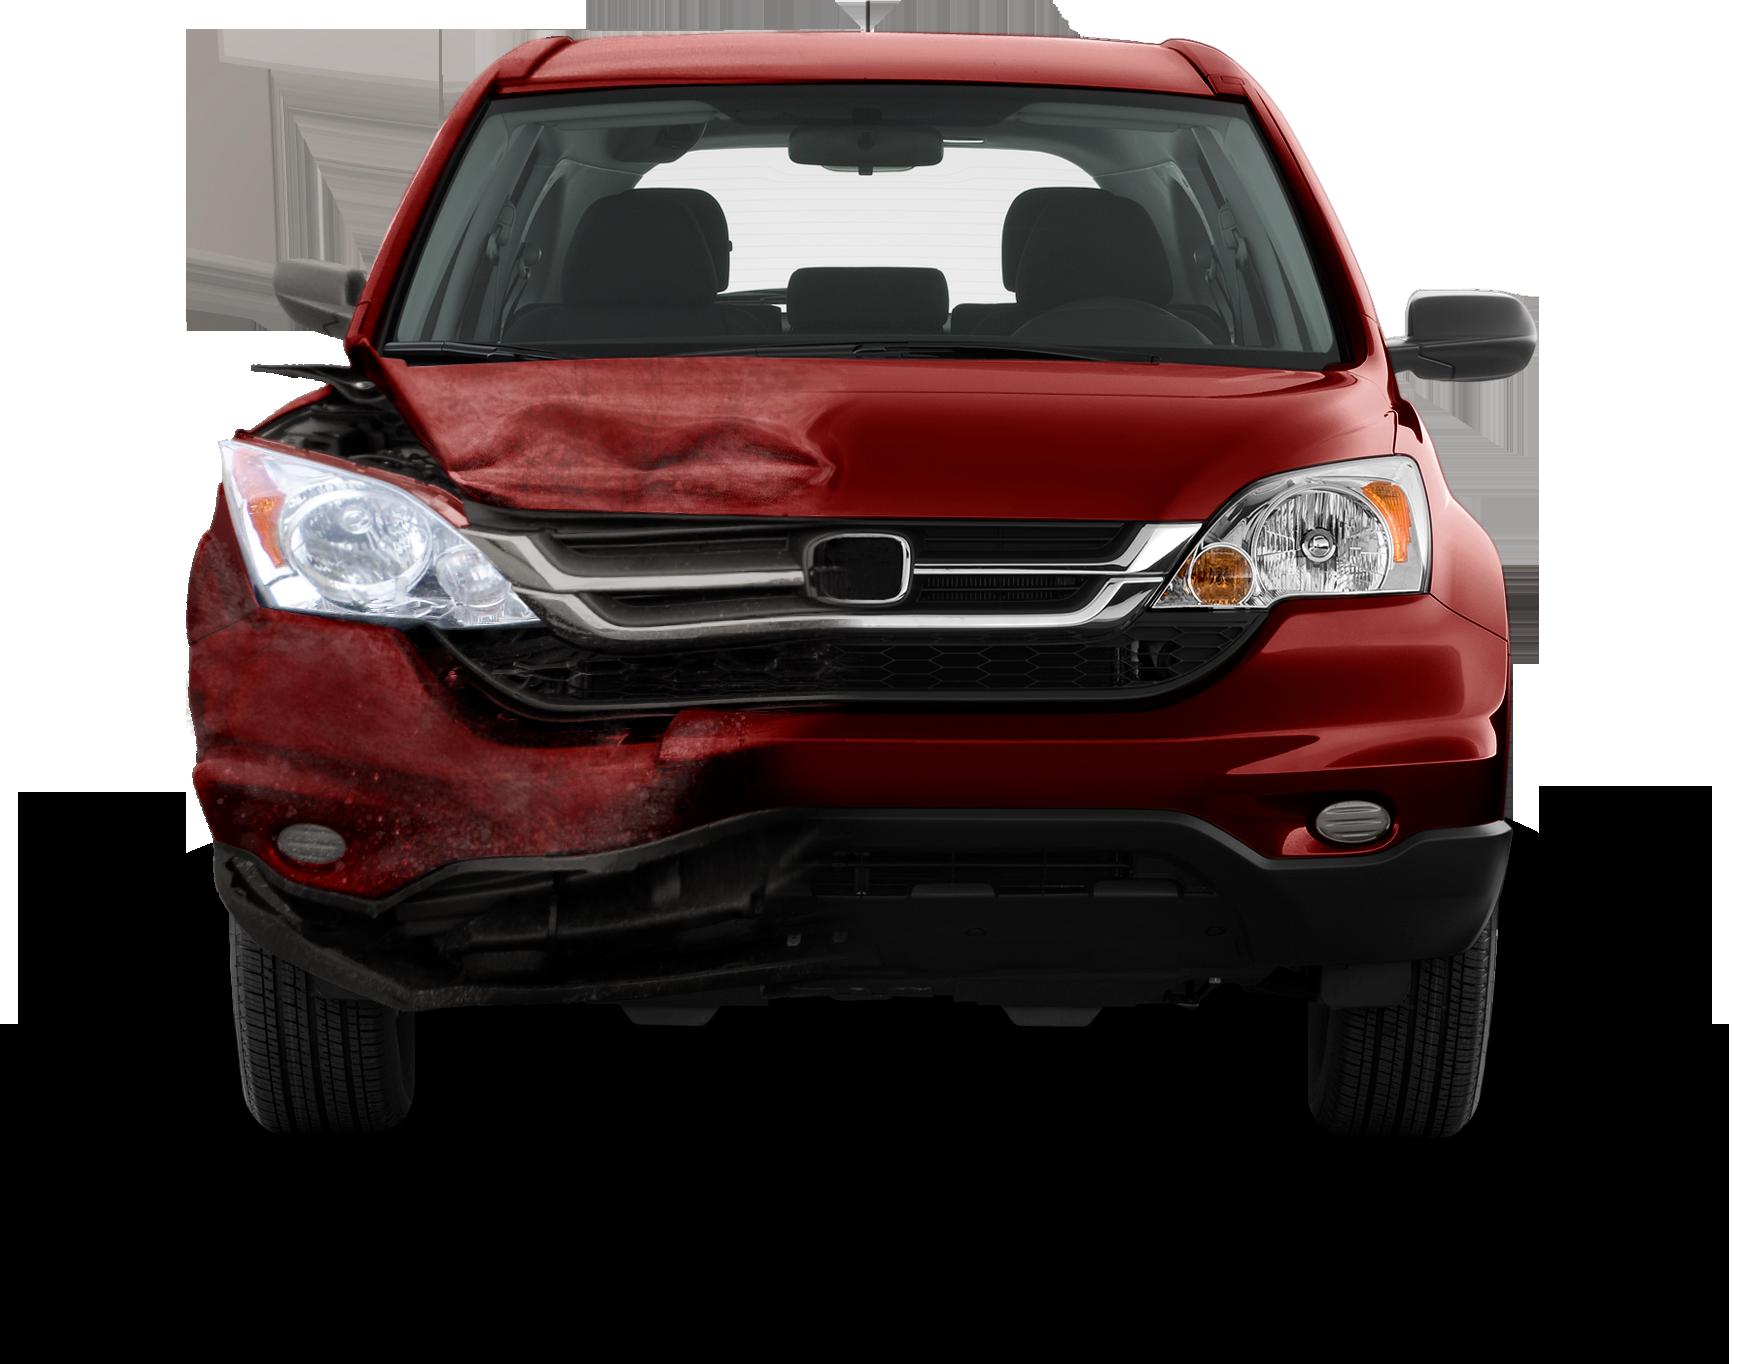 Drivecrash Hero Red Wk